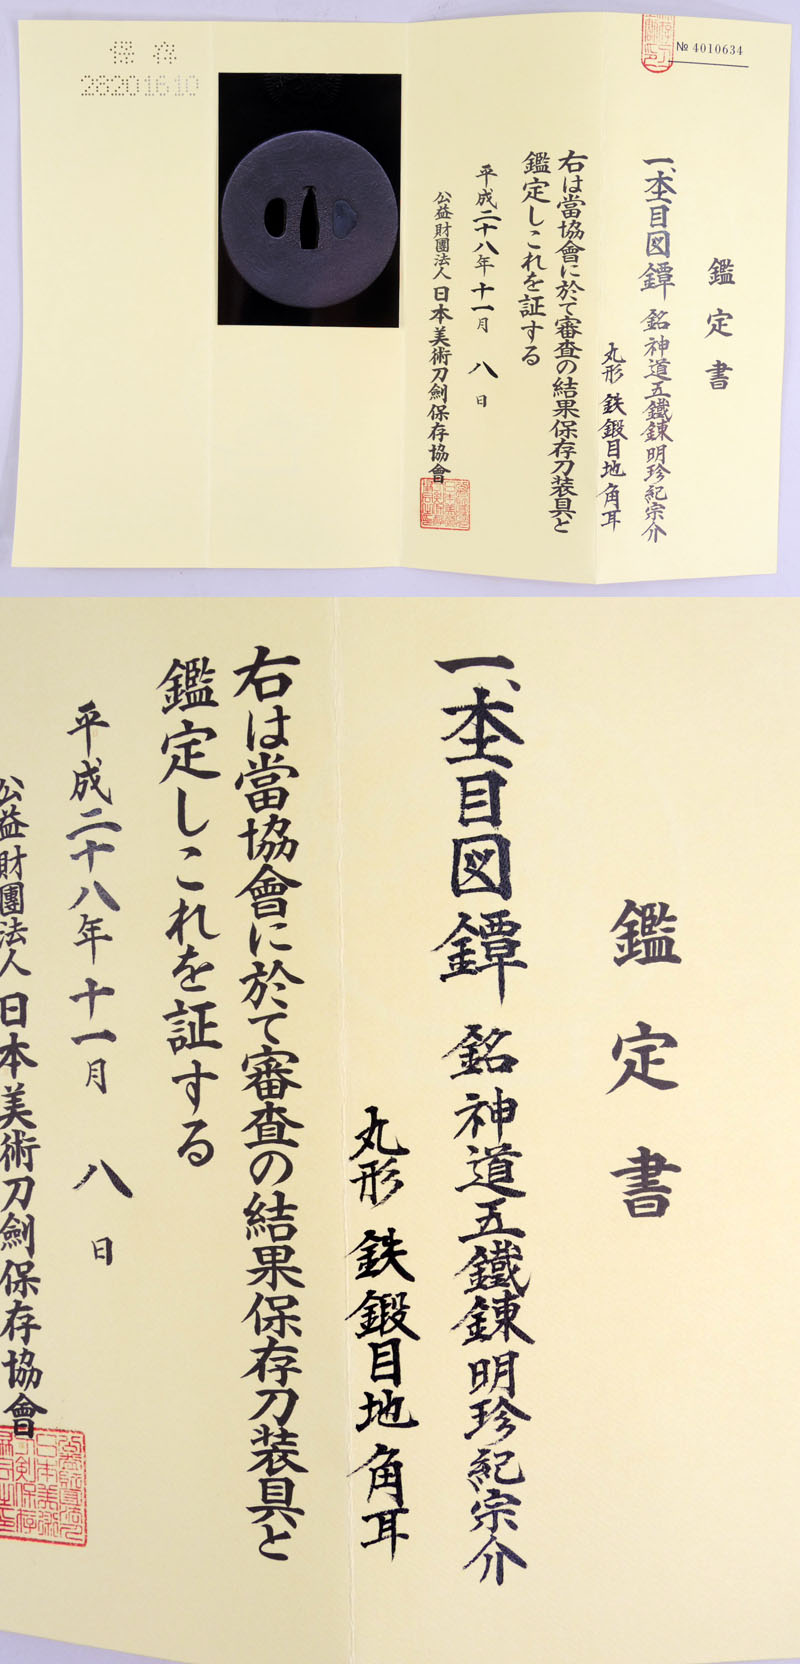 杢目図鍔 銘 神道五識錬明珍紀宗介 Picture of Certificate